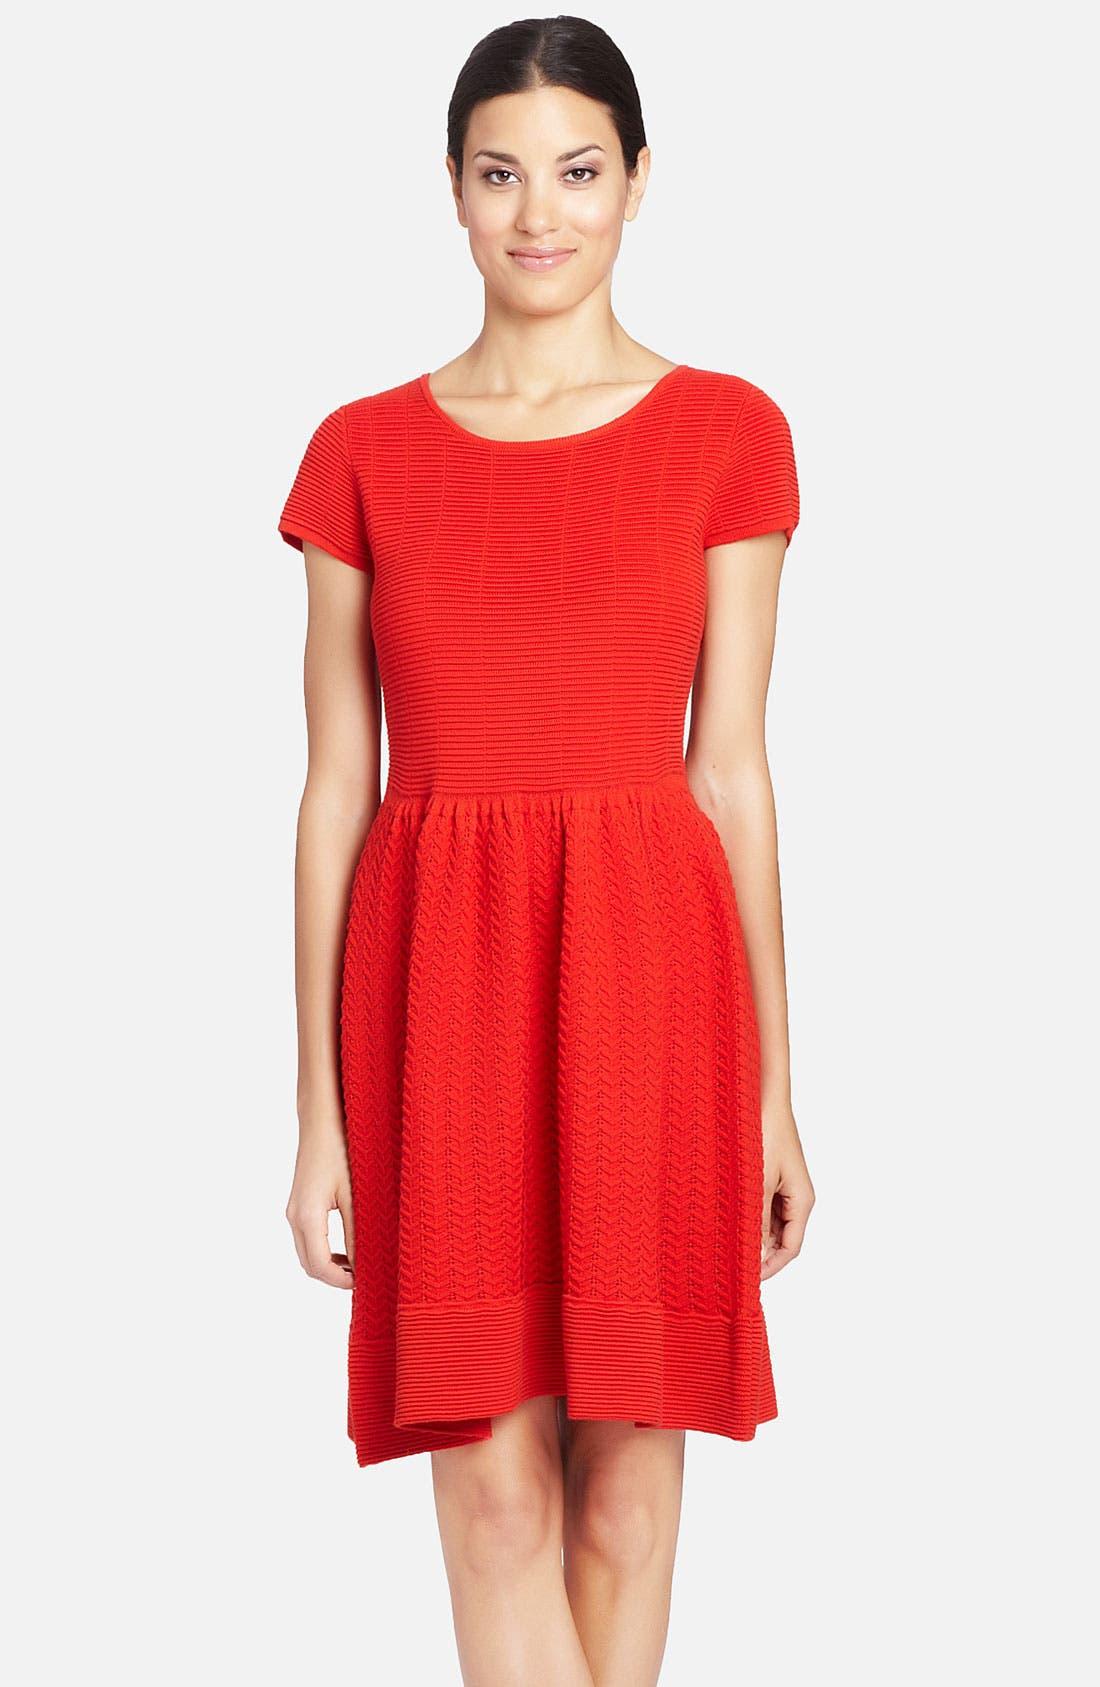 Main Image - Cynthia Steffe 'Marley' Knit Merino Wool Fit & Flare Dress